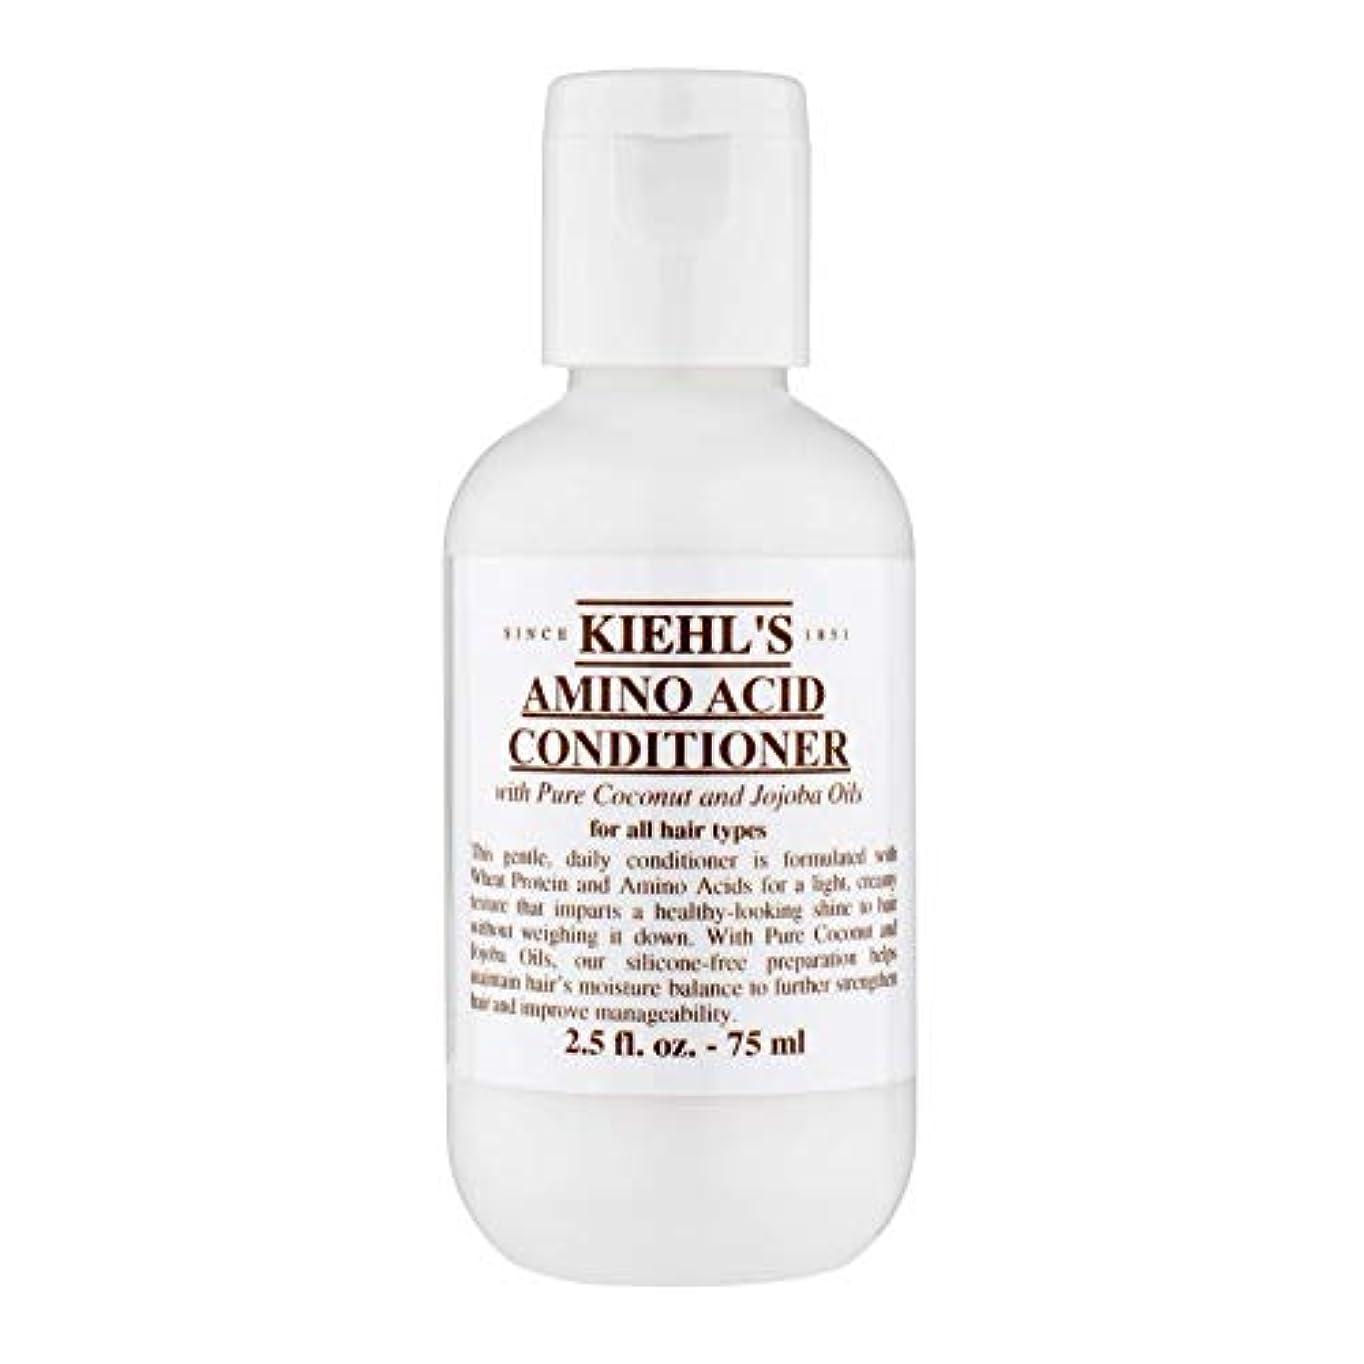 [Kiehl's ] キールズアミノ酸コンディショナー75ミリリットル - Kiehl's Amino Acid Conditioner 75ml [並行輸入品]